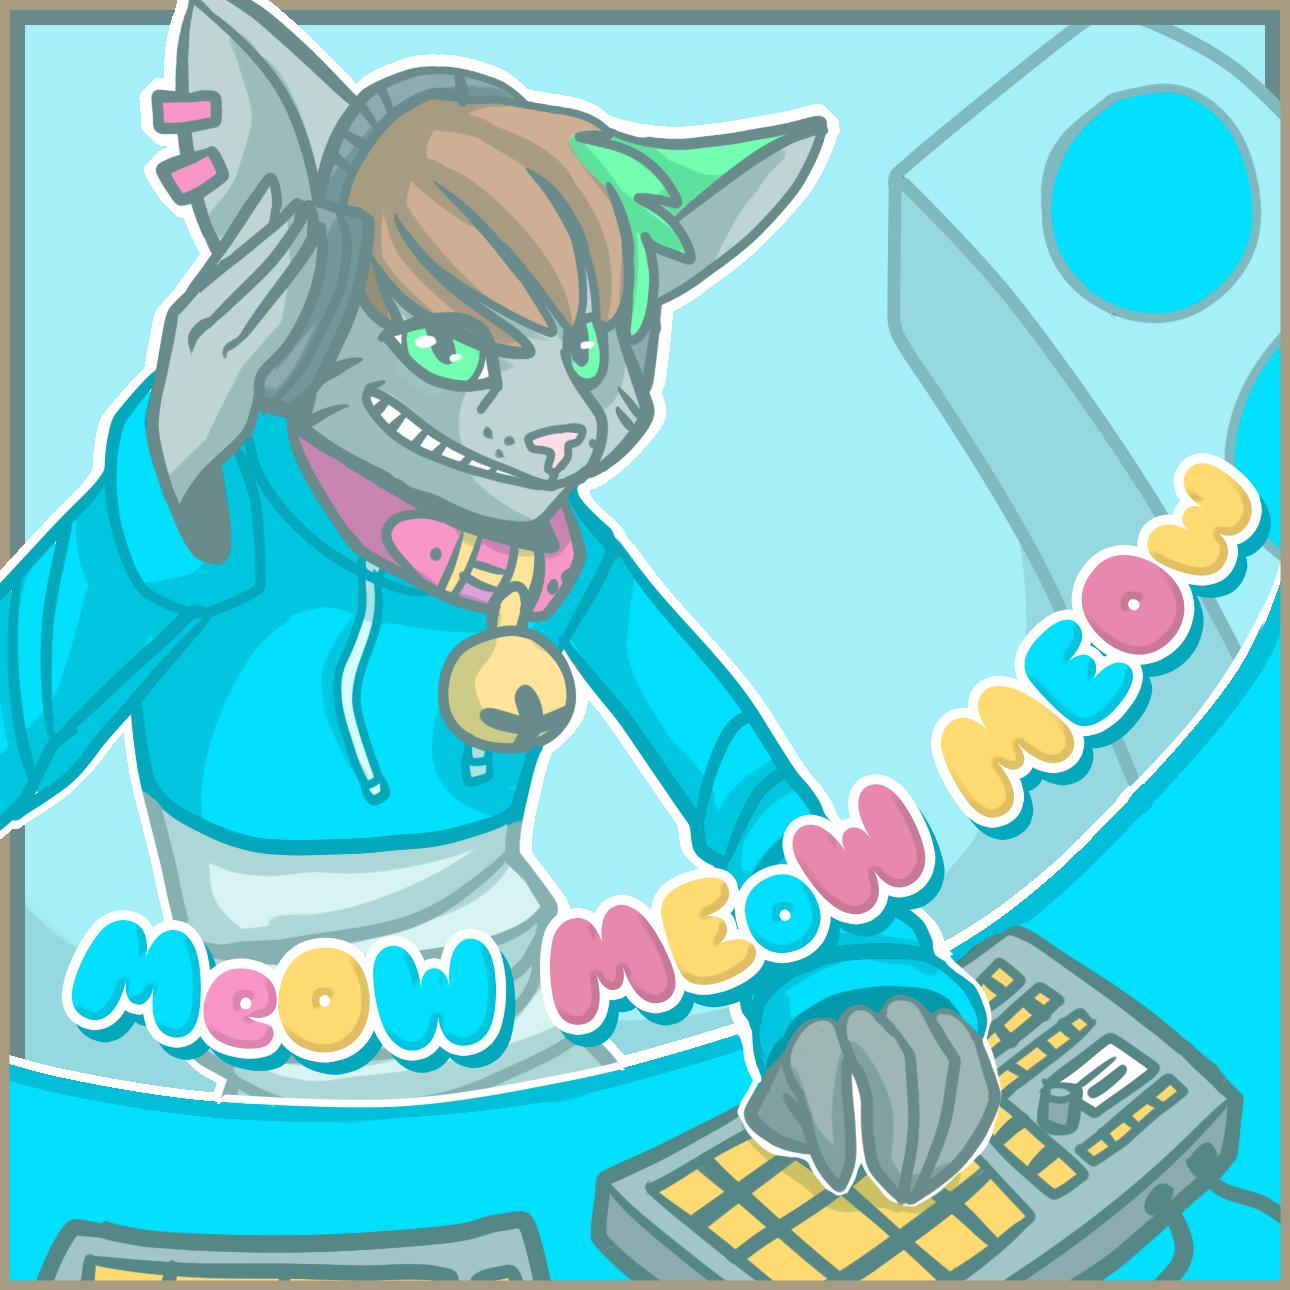 weasyl.com/profile/cosmic